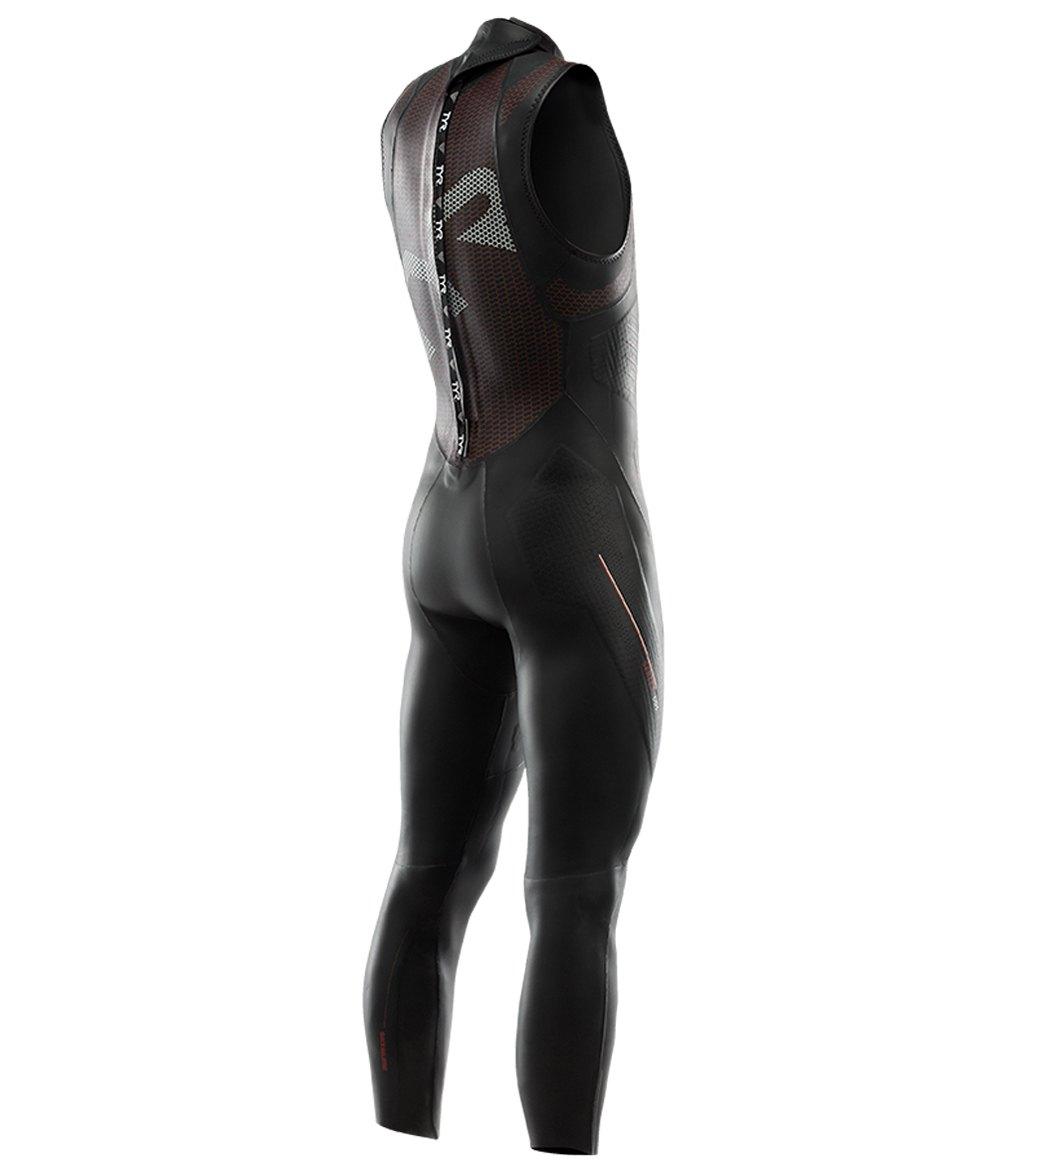 5e8fe7df31cc1 TYR Men s Hurricane Cat 5 Sleeveless Triathlon Wetsuit at SwimOutlet.com -  Free Shipping